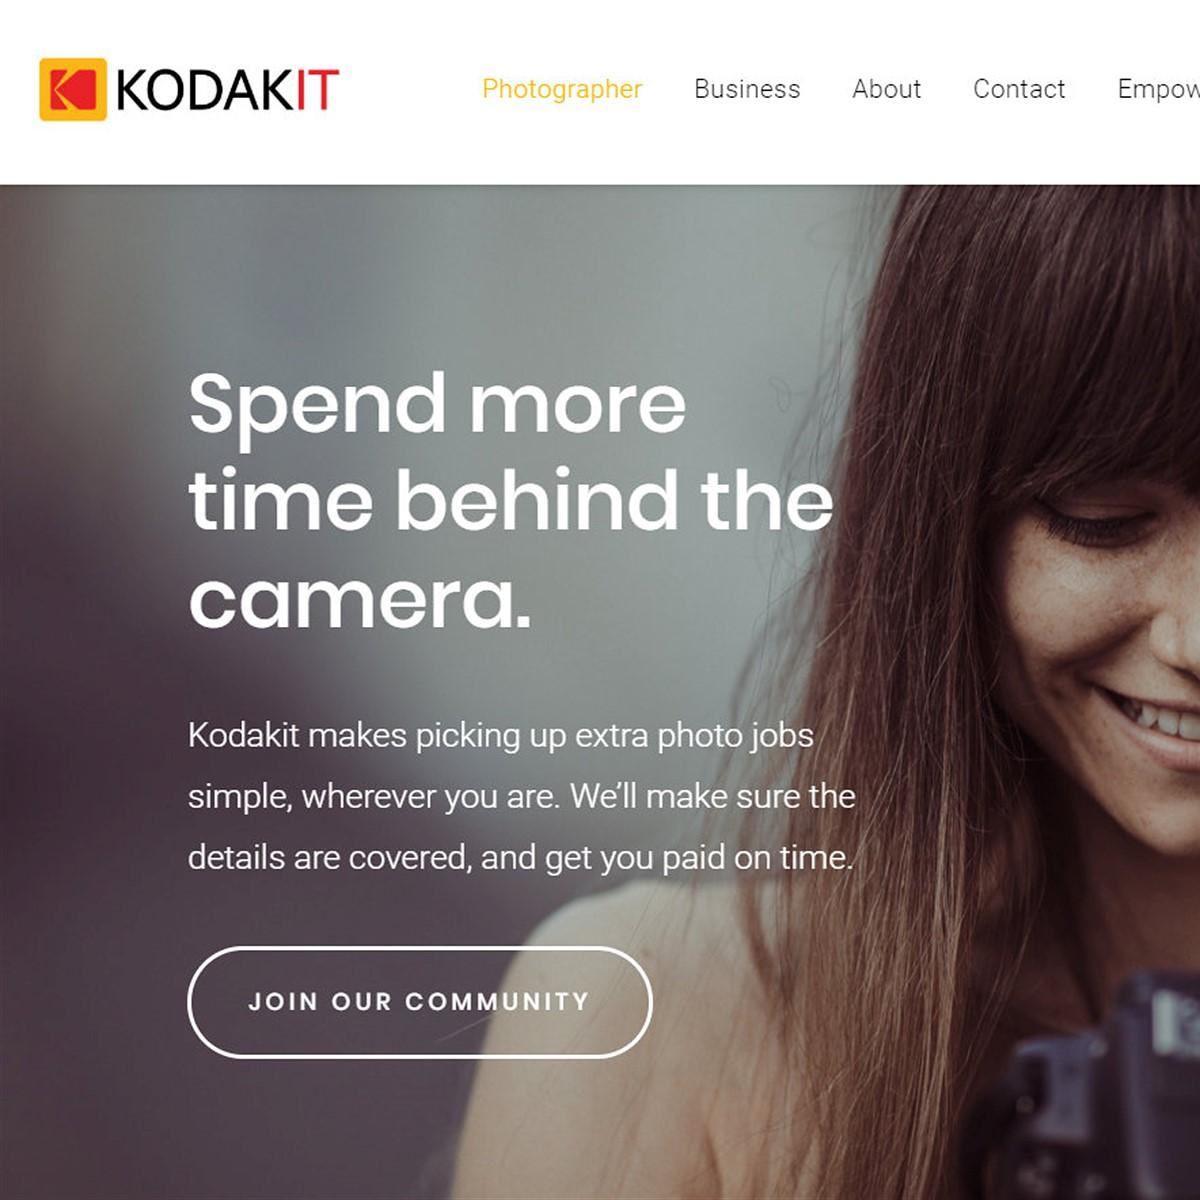 Kodak's photo service KodakIt criticized for stripping photographers